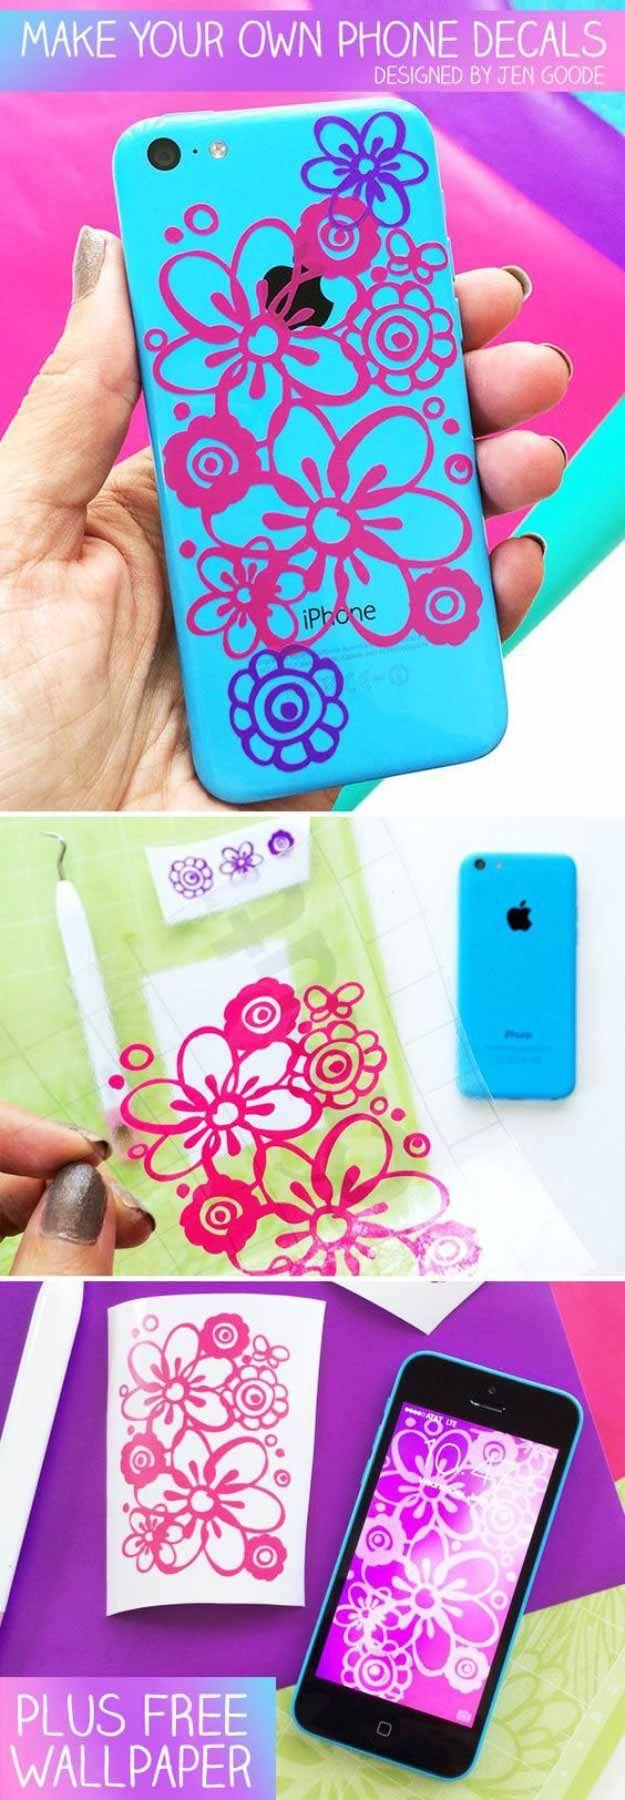 DIY Cricut Crafts Ideas Iphone Decal Cricut And Craft - How to make vinyl decals with cricut explore air